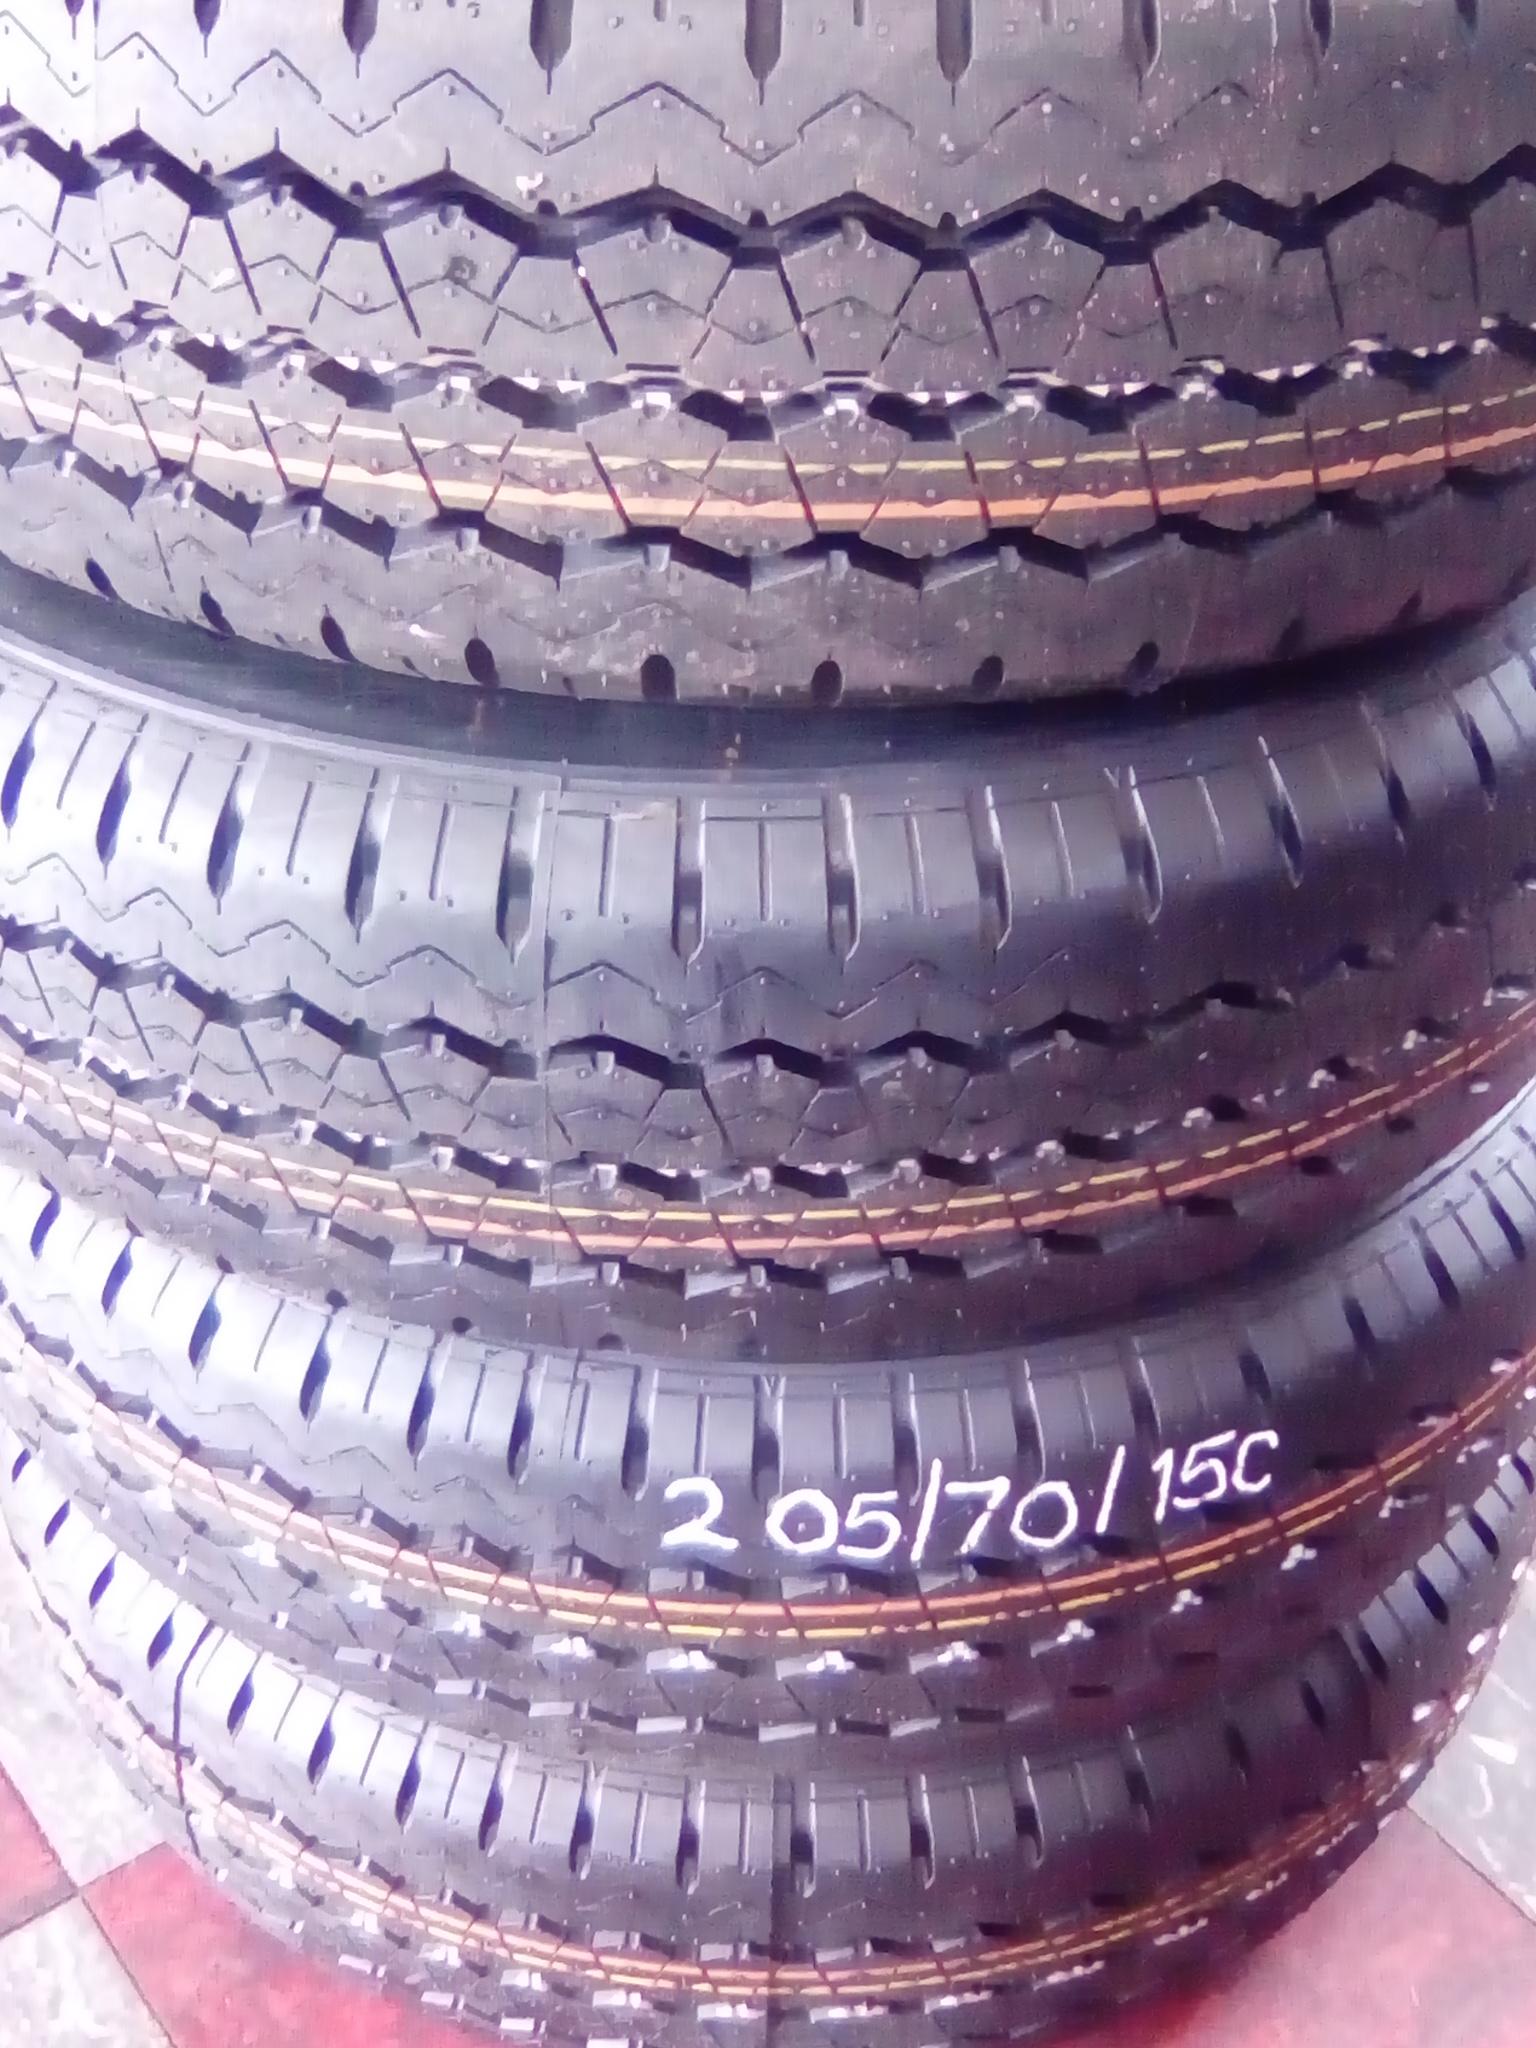 Bridgestone tyre size 205/70/R15 x 4